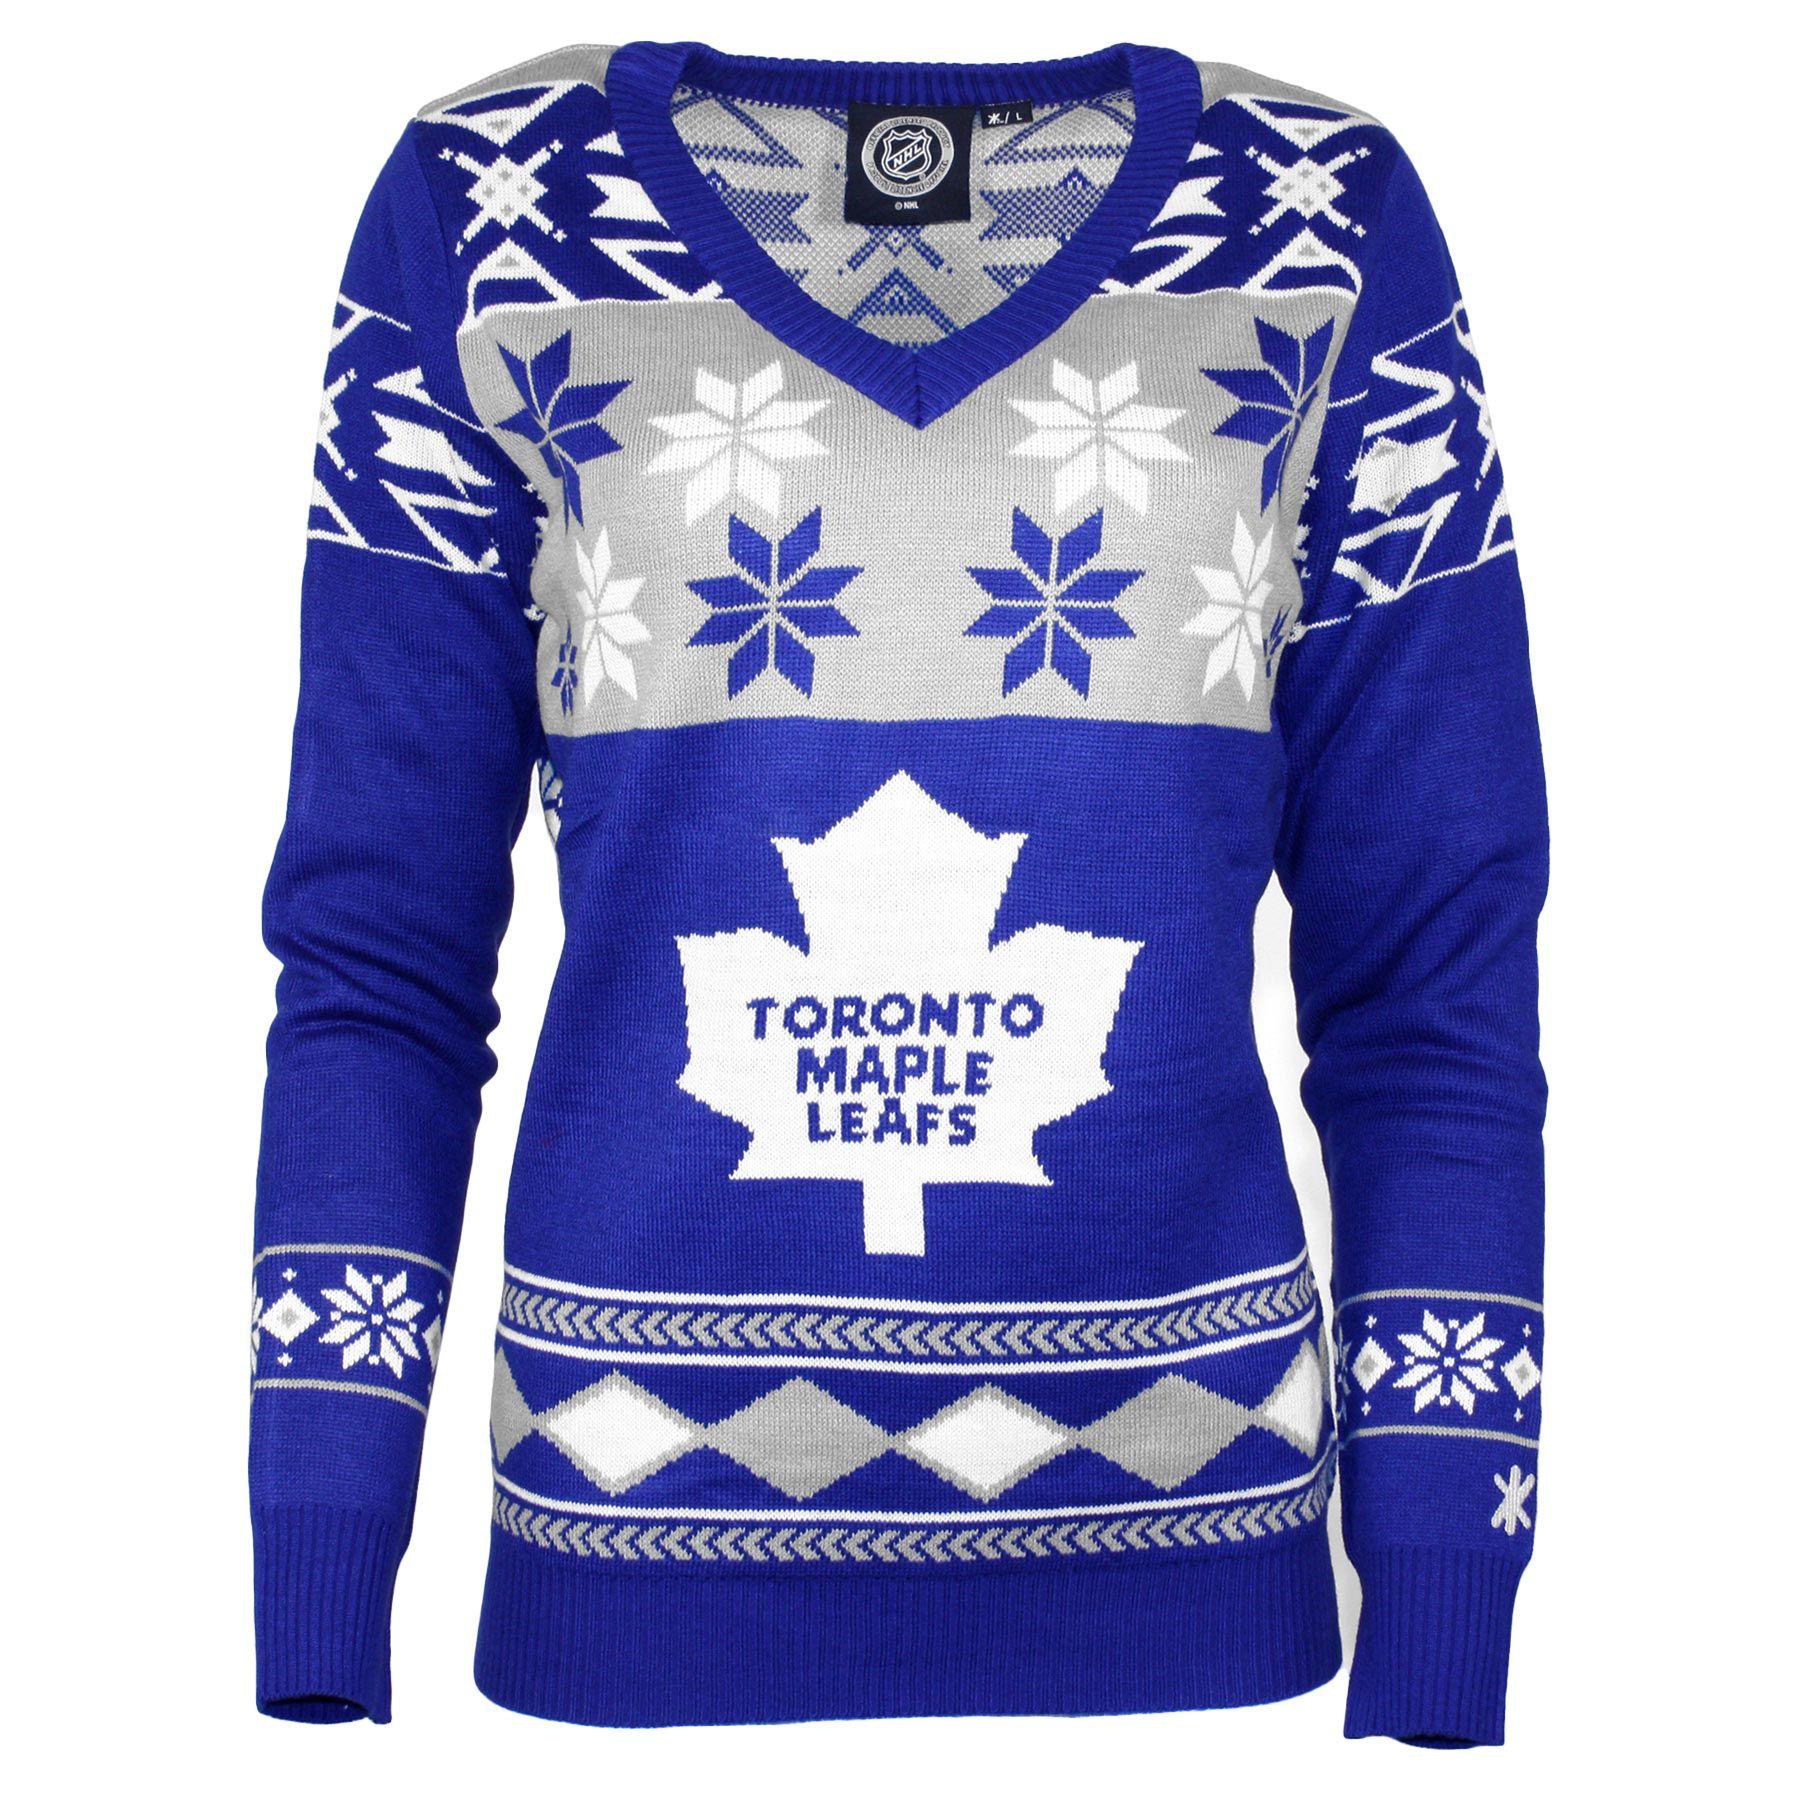 wholesale dealer cf028 4f4e8 Toronto Maple Leafs Women's Nhl 2015 Ugly V-neck Holiday ...